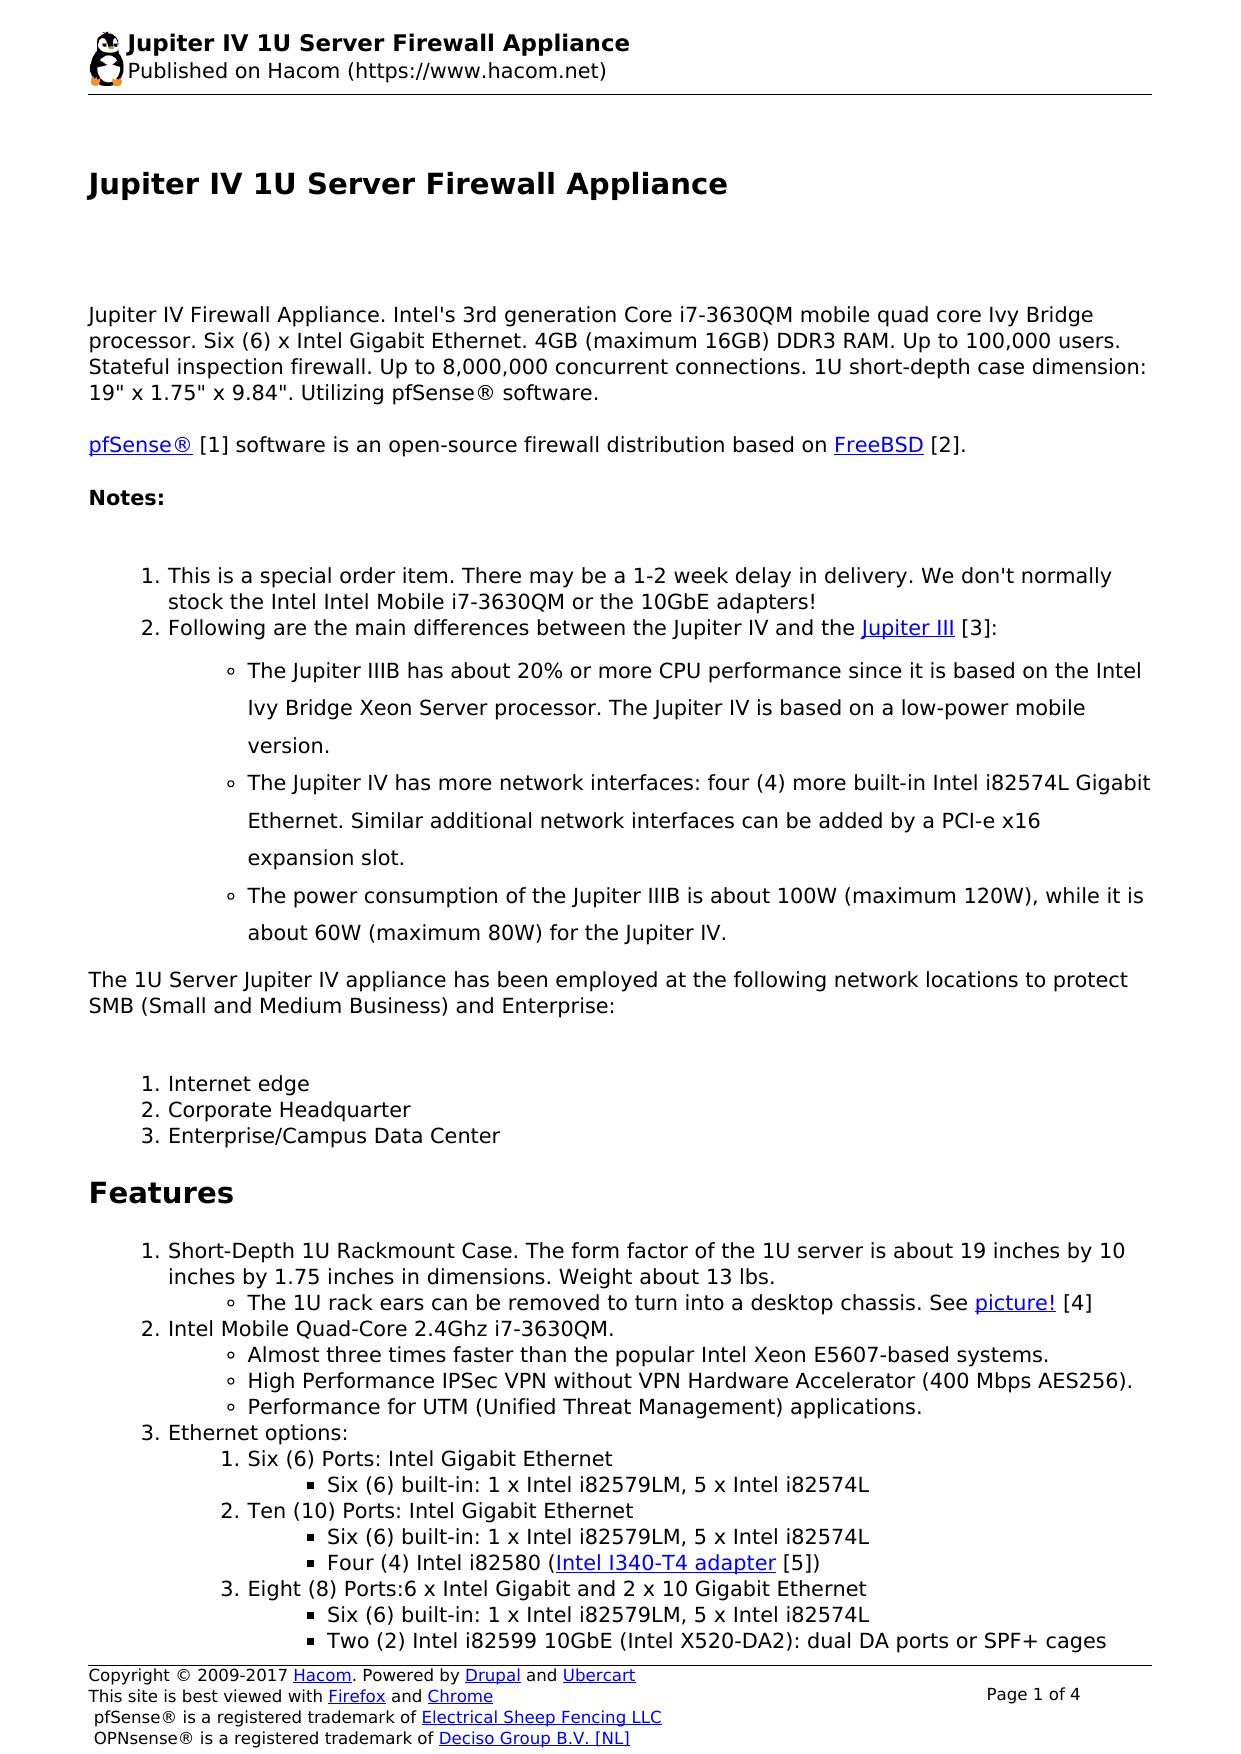 Jupiter IV 1U Server Firewall Appliance | manualzz com